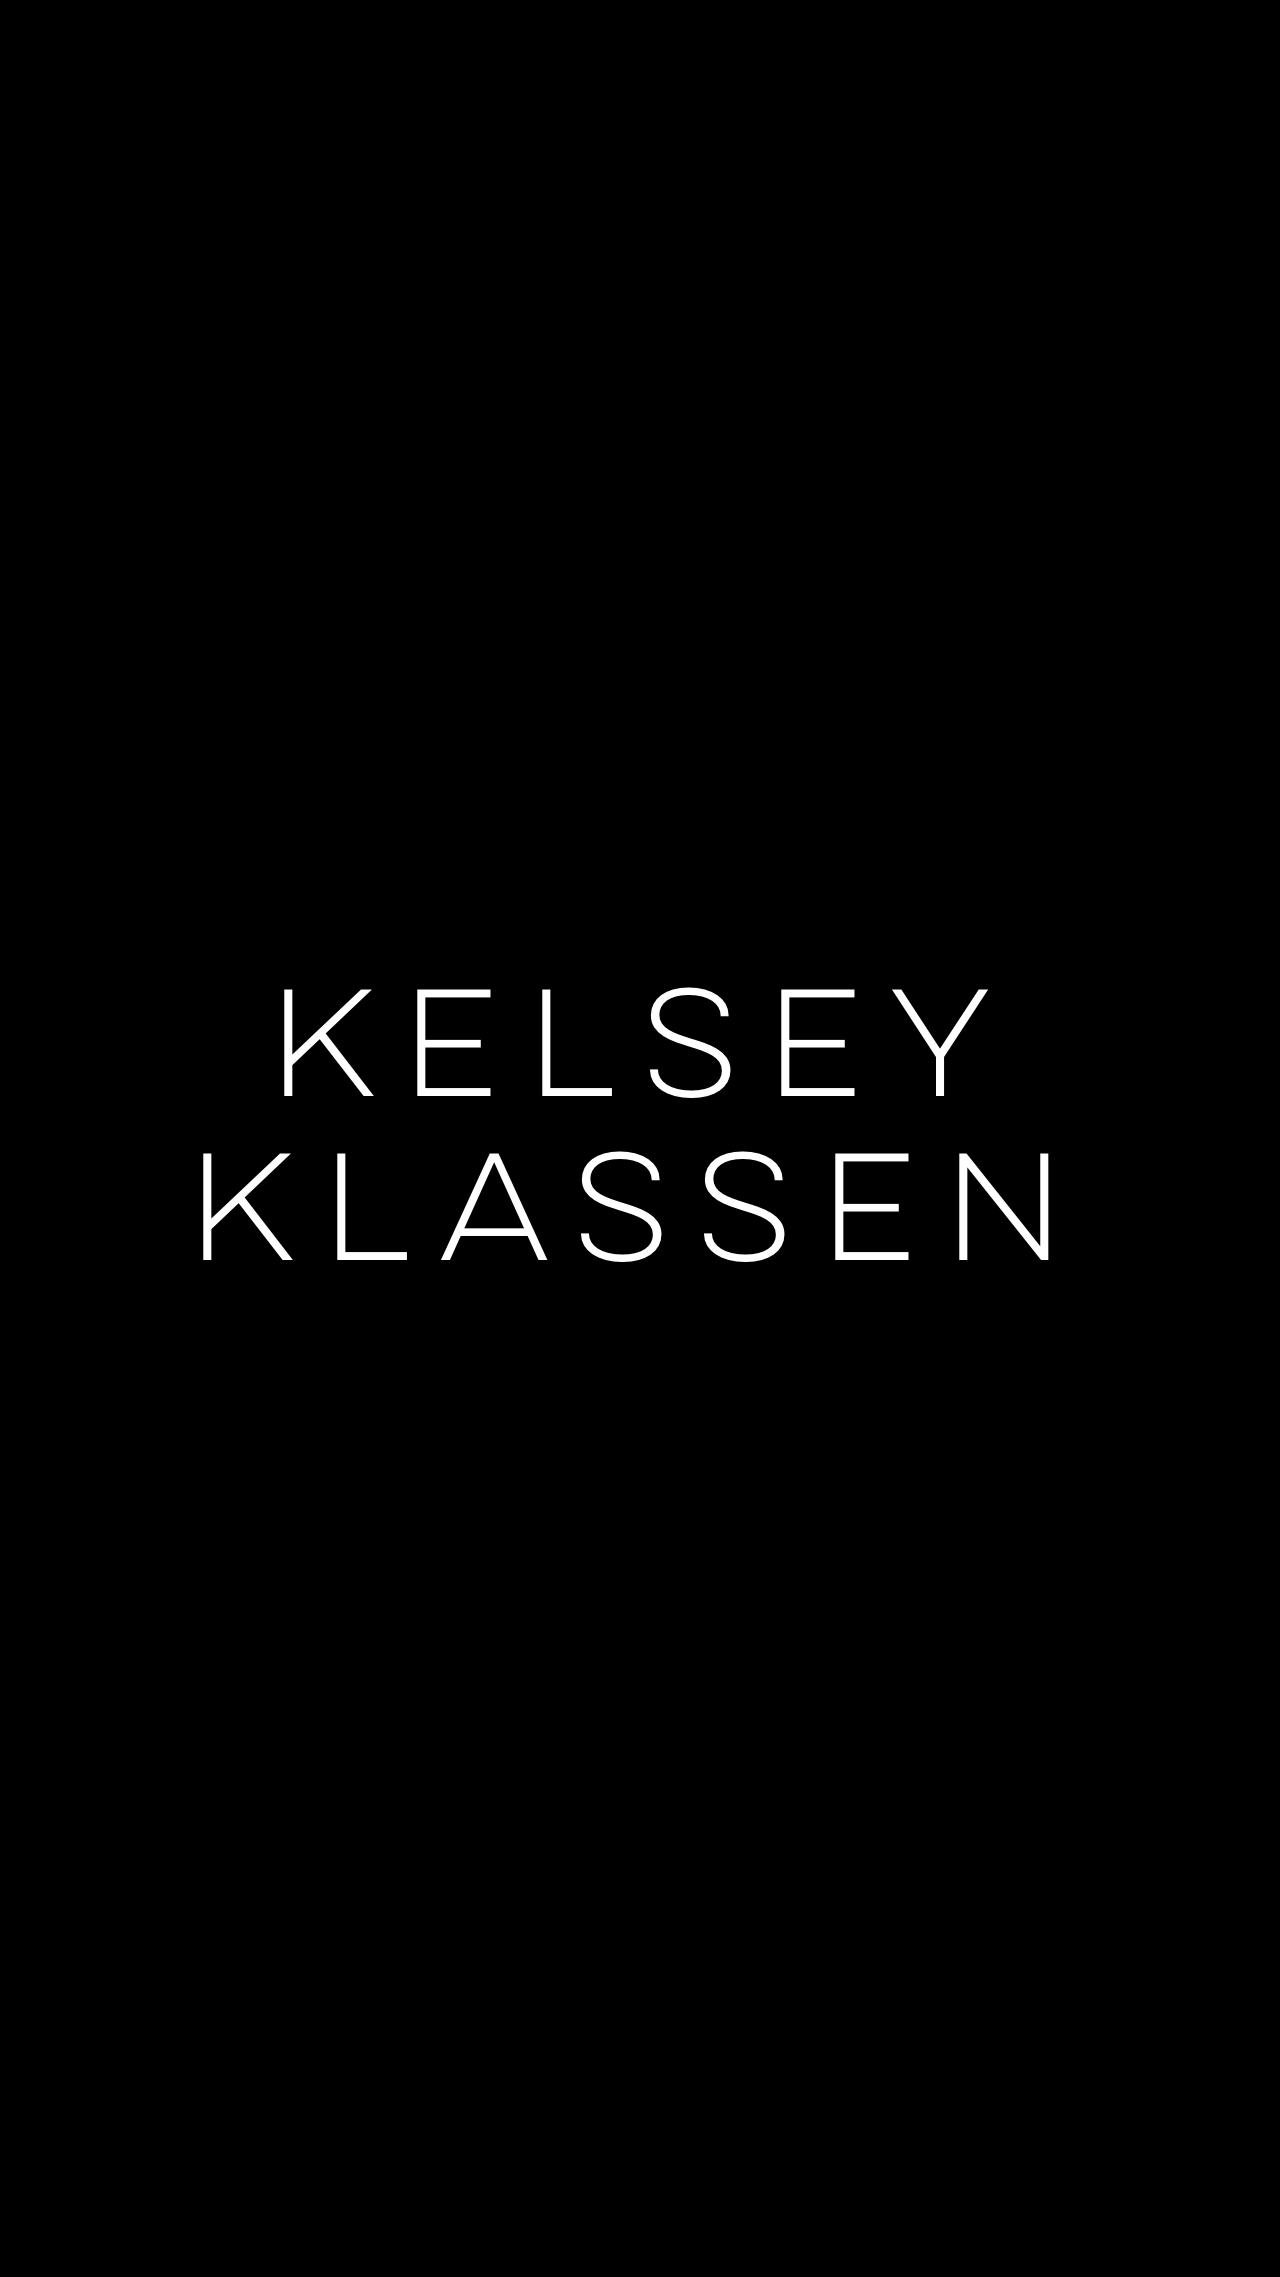 KELSEY KLASSEN.jpg